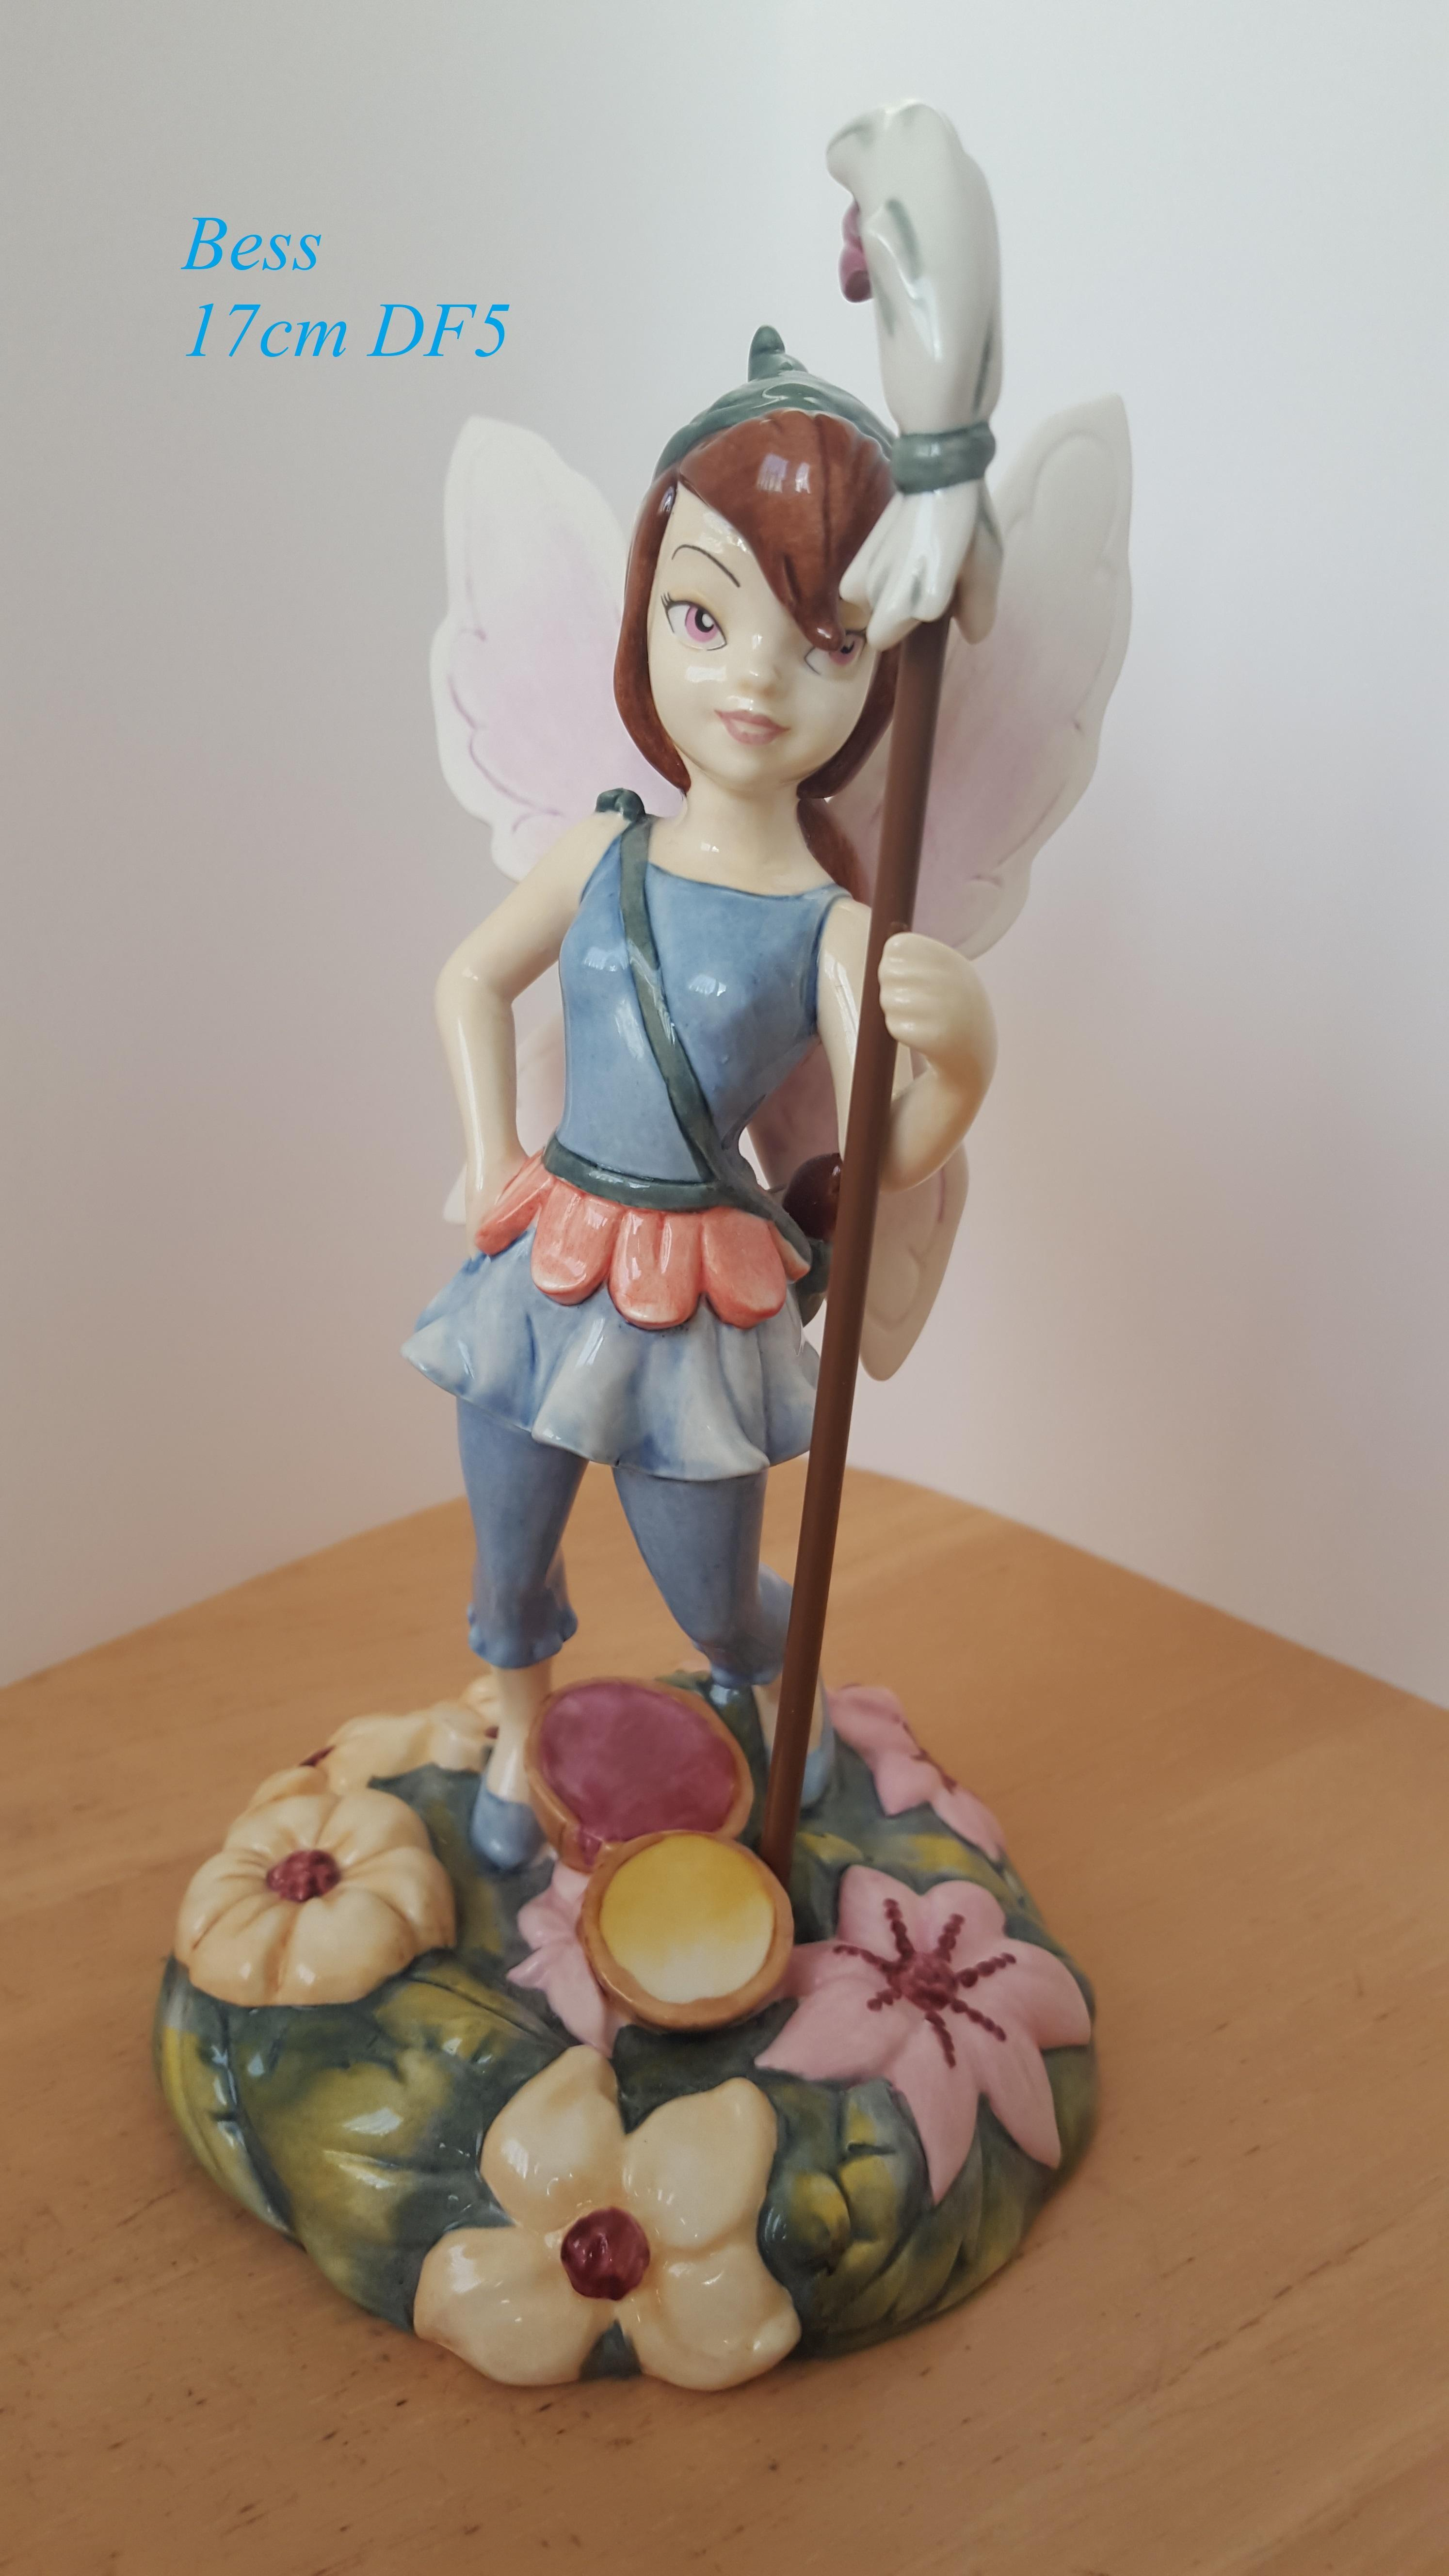 ROYAL DOULTON Disney Fairies Collection Figurine Bess 17cm